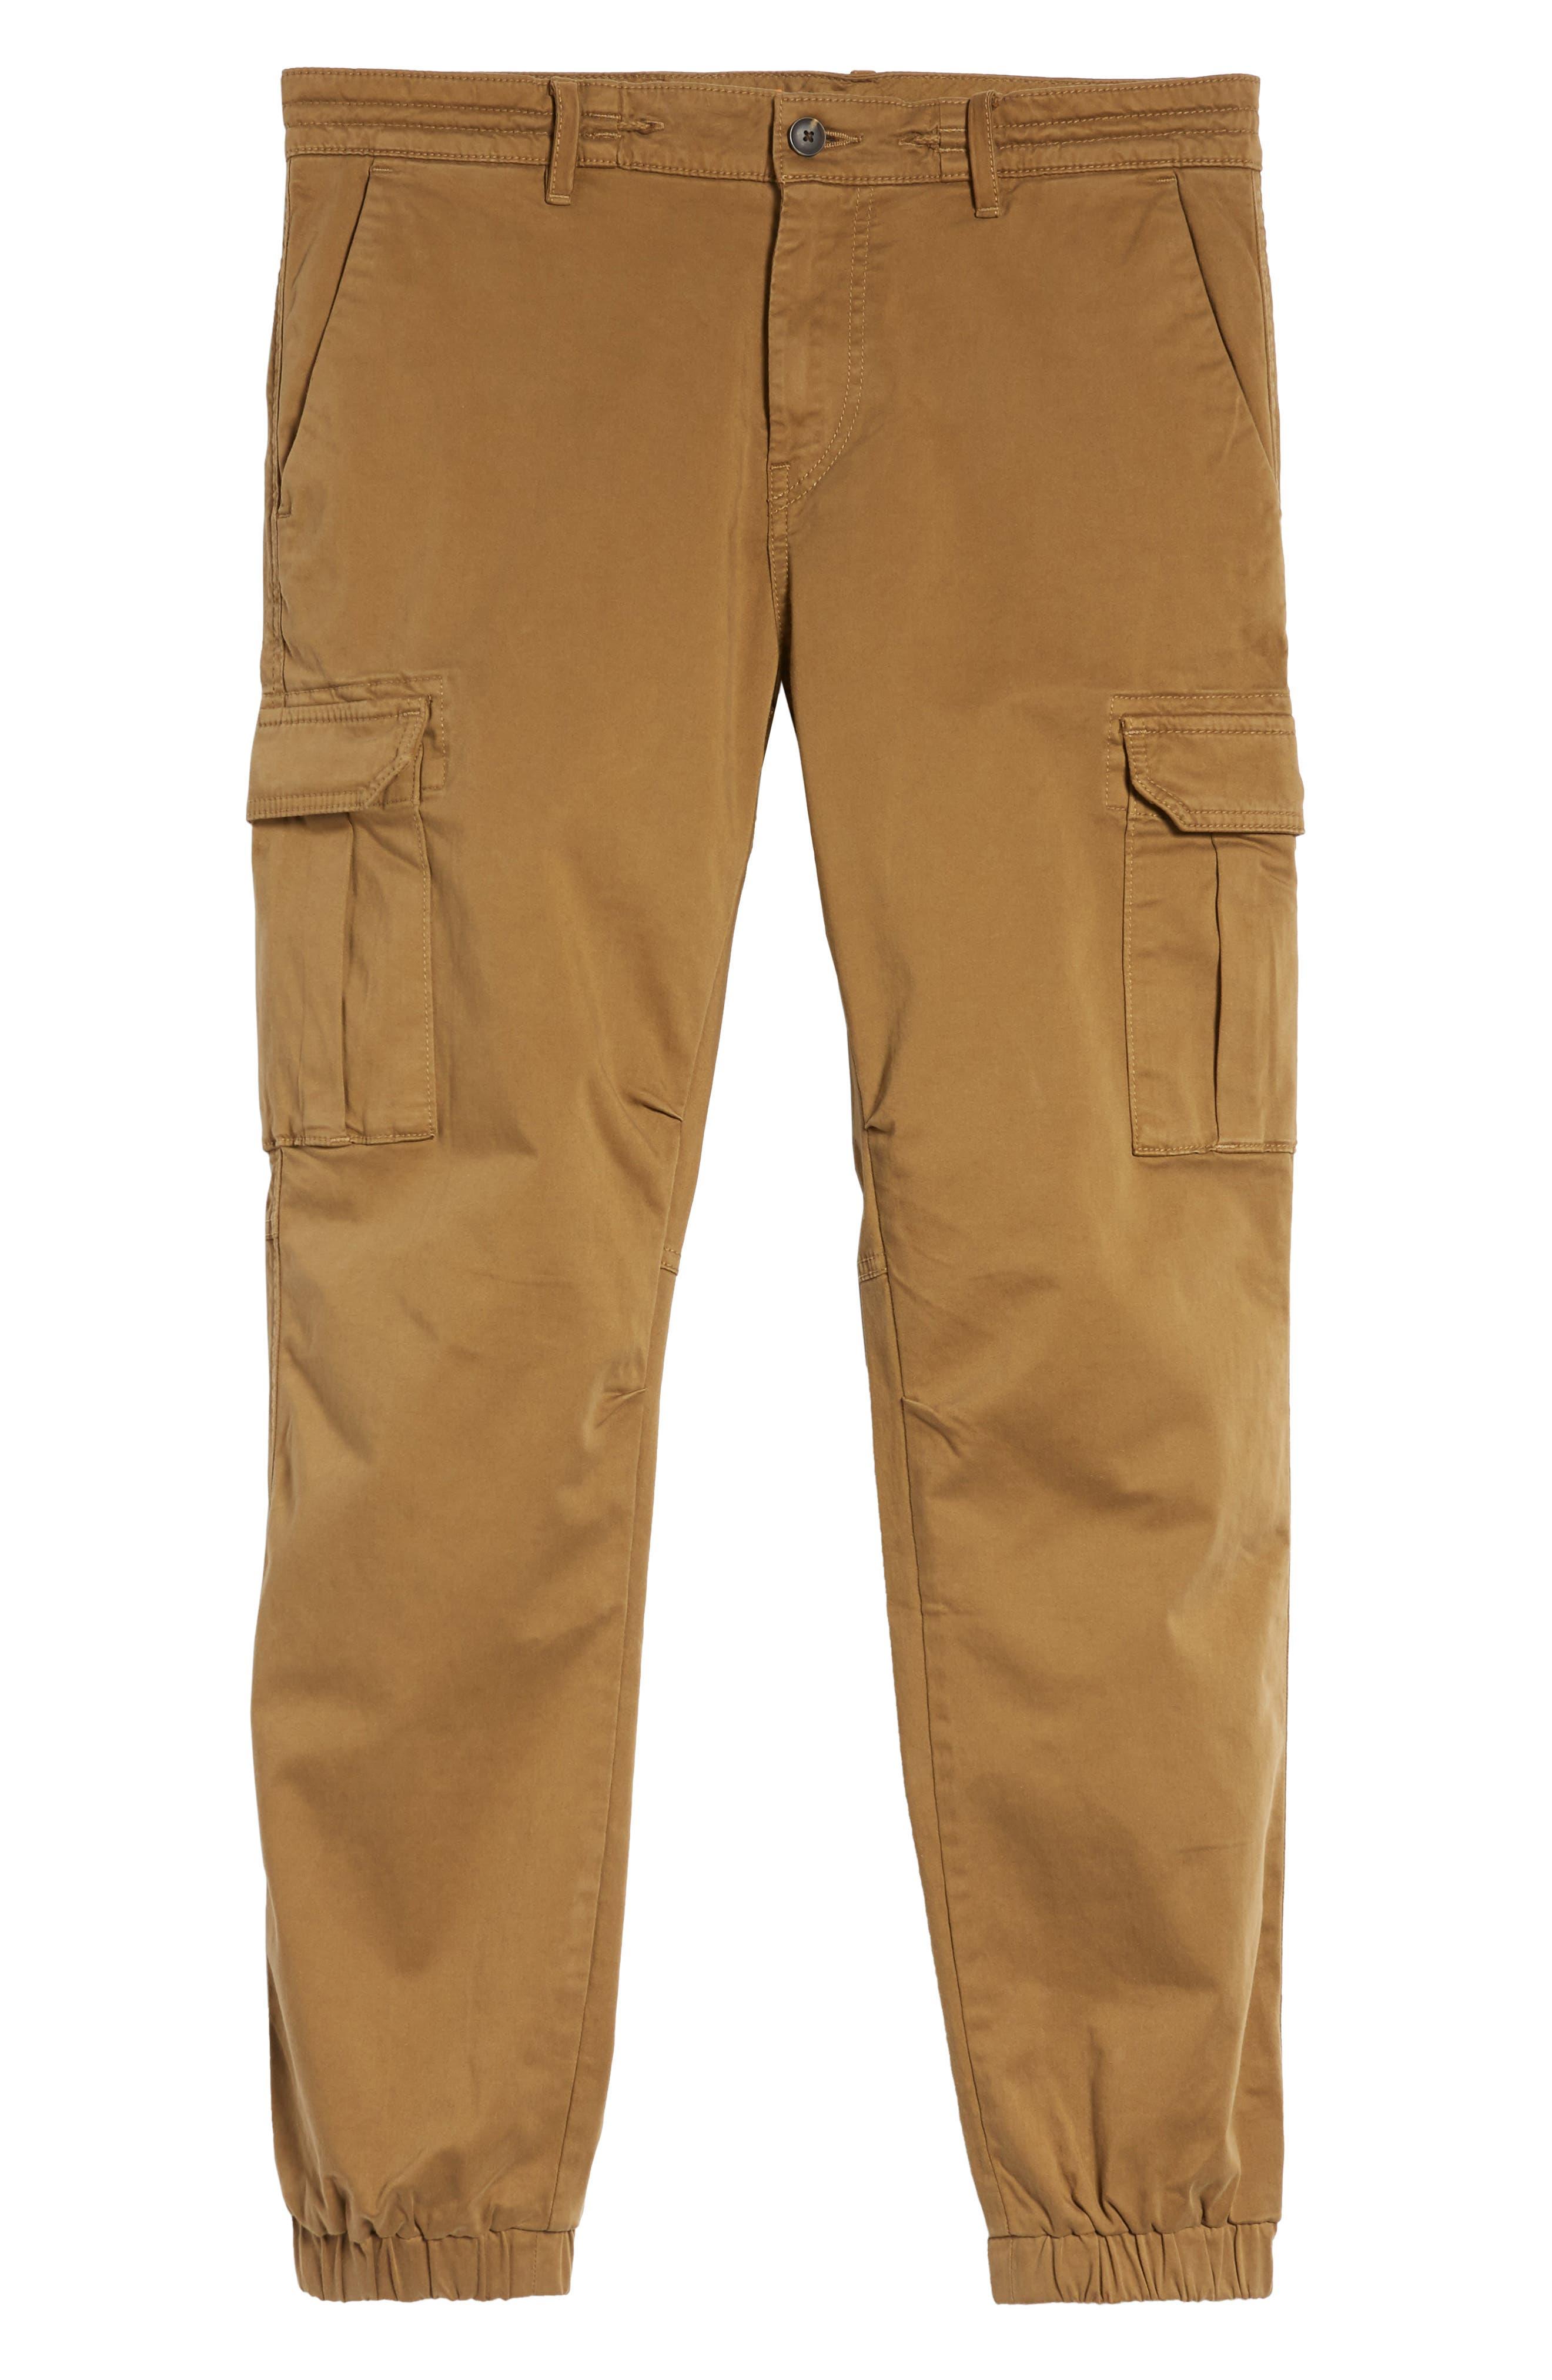 Shay 2 Cargo Pants,                             Alternate thumbnail 6, color,                             Open Beige